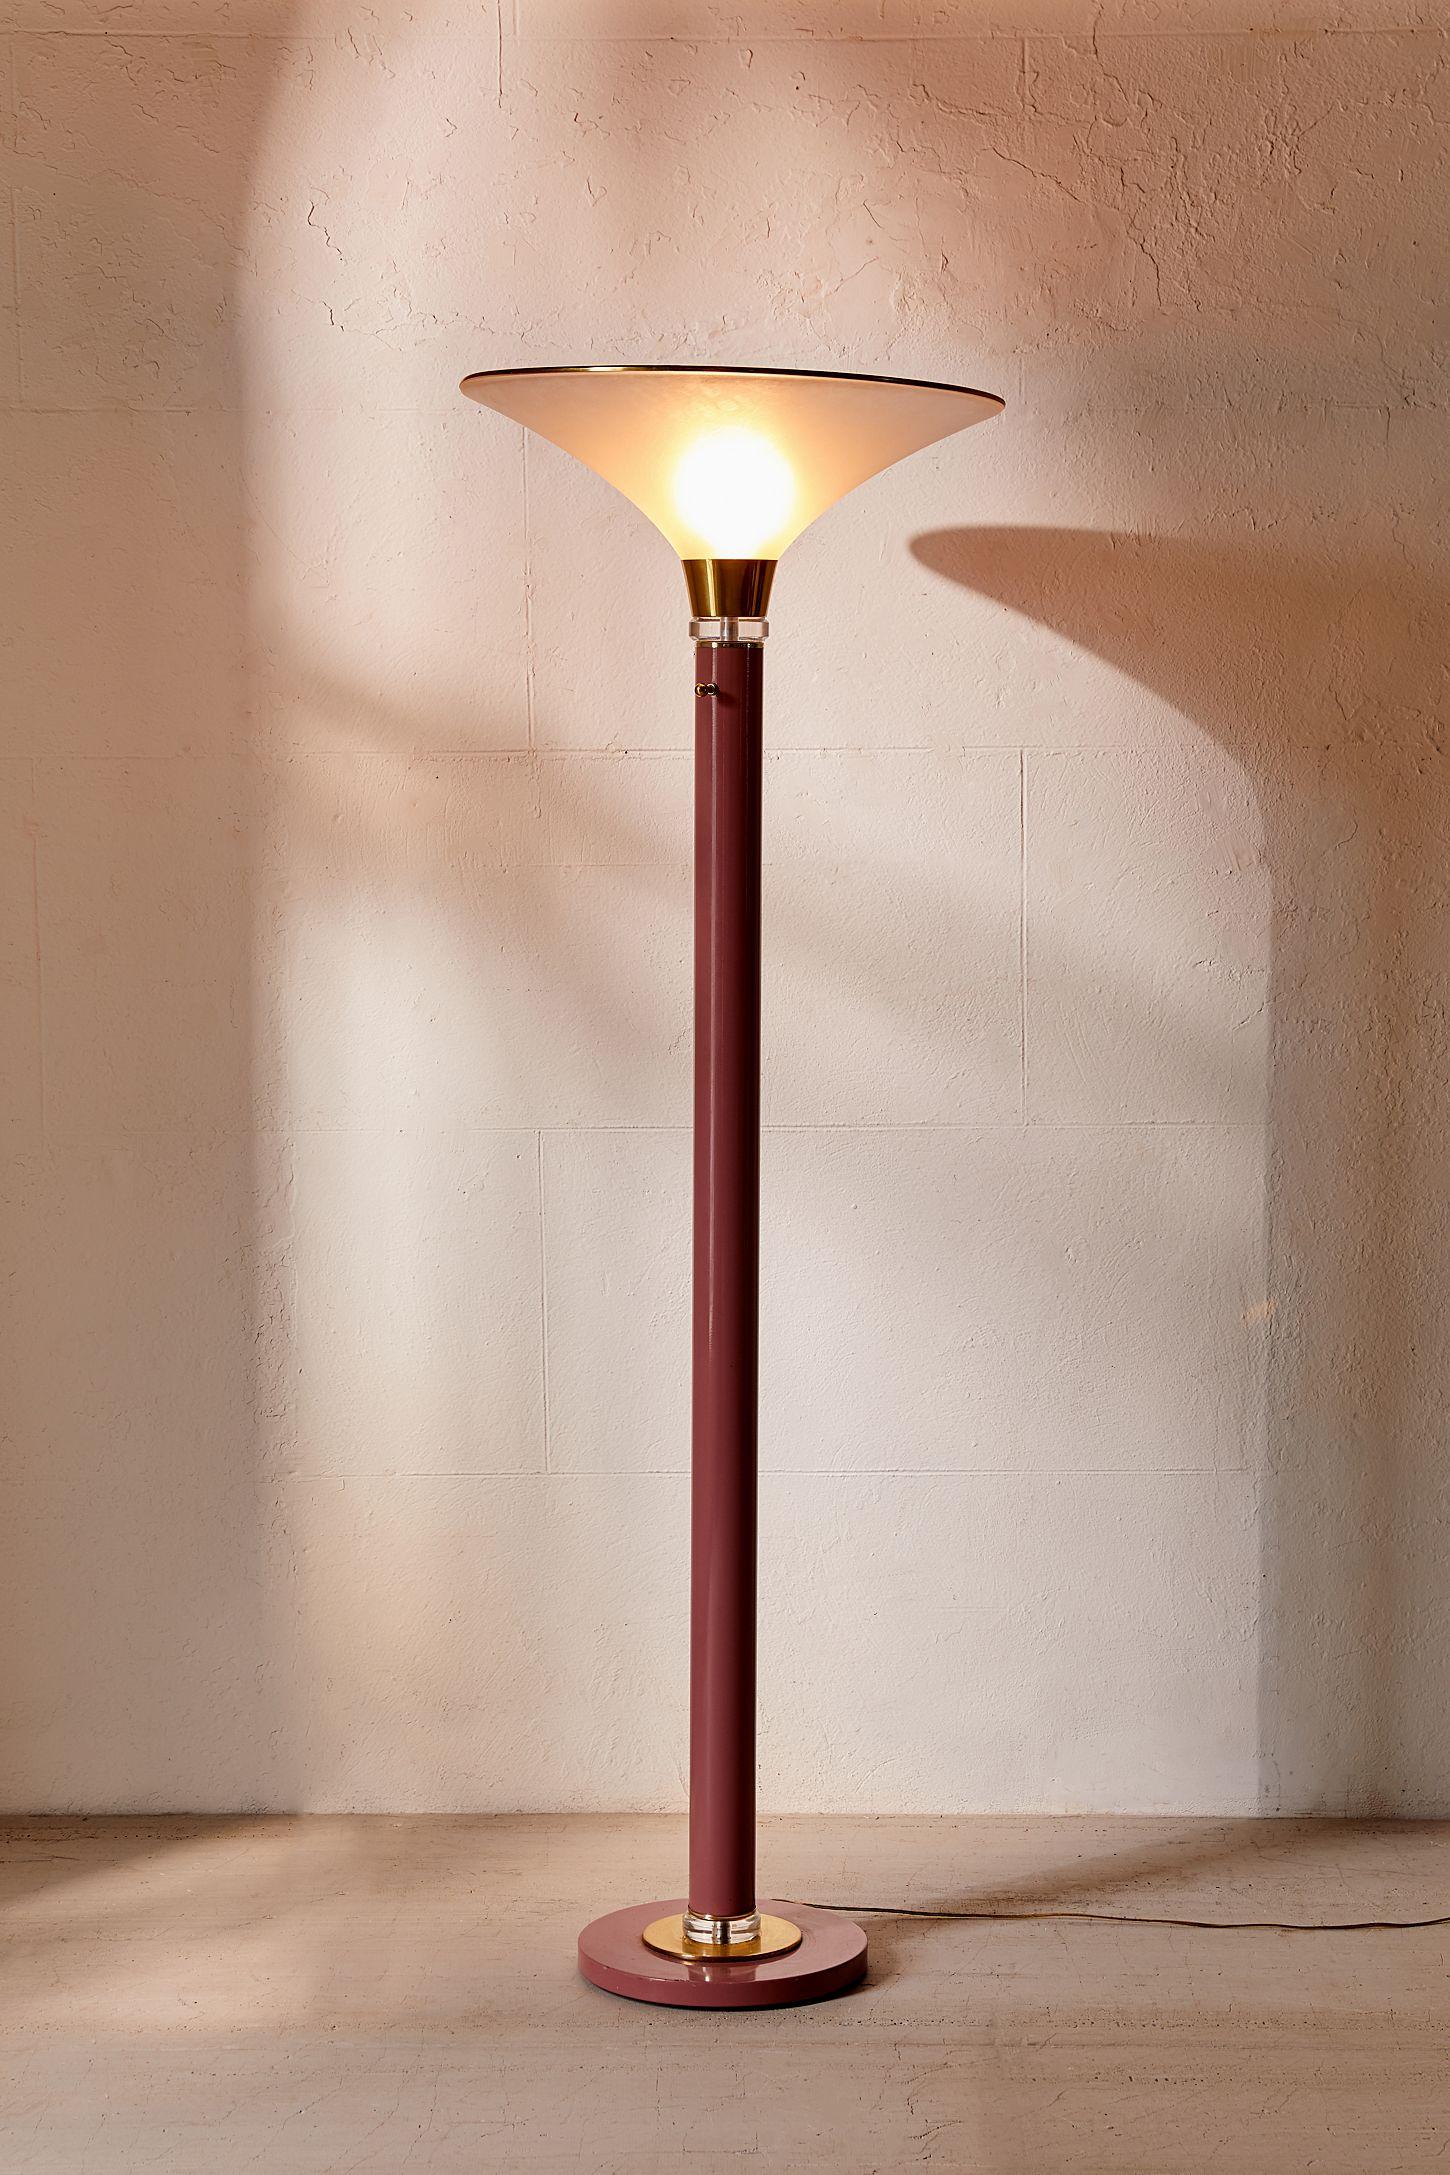 Odd Eye For Urban Renewal One Of A Kind Floor Lamp